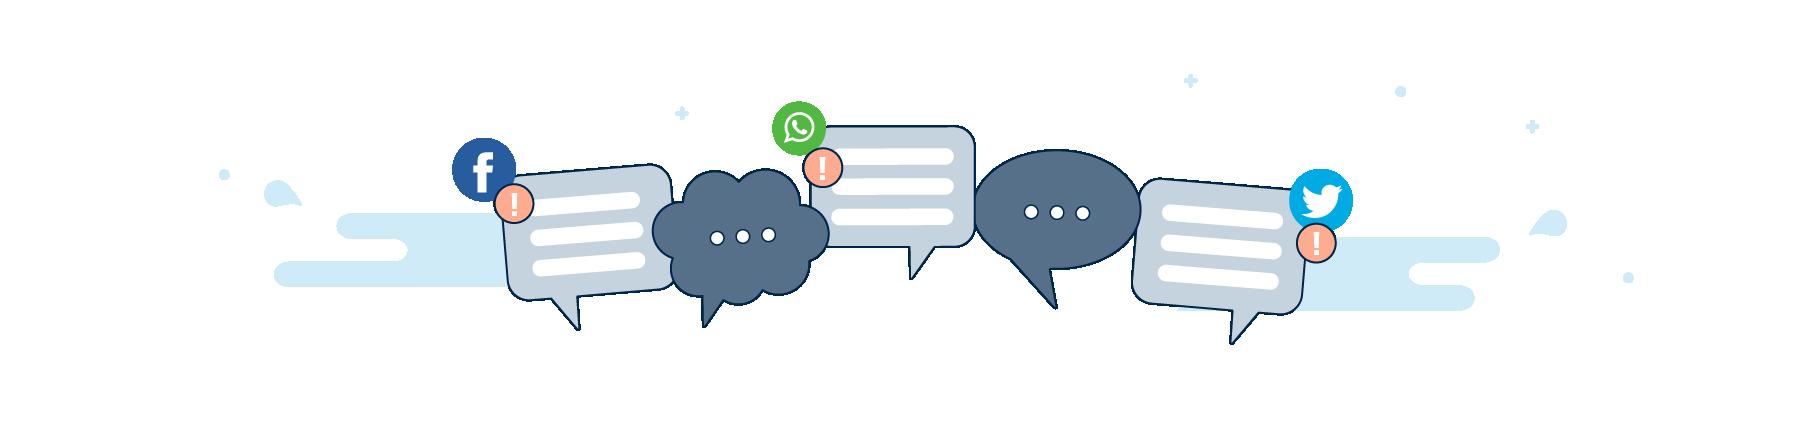 dialoog-crisiscommunicatie-social-media